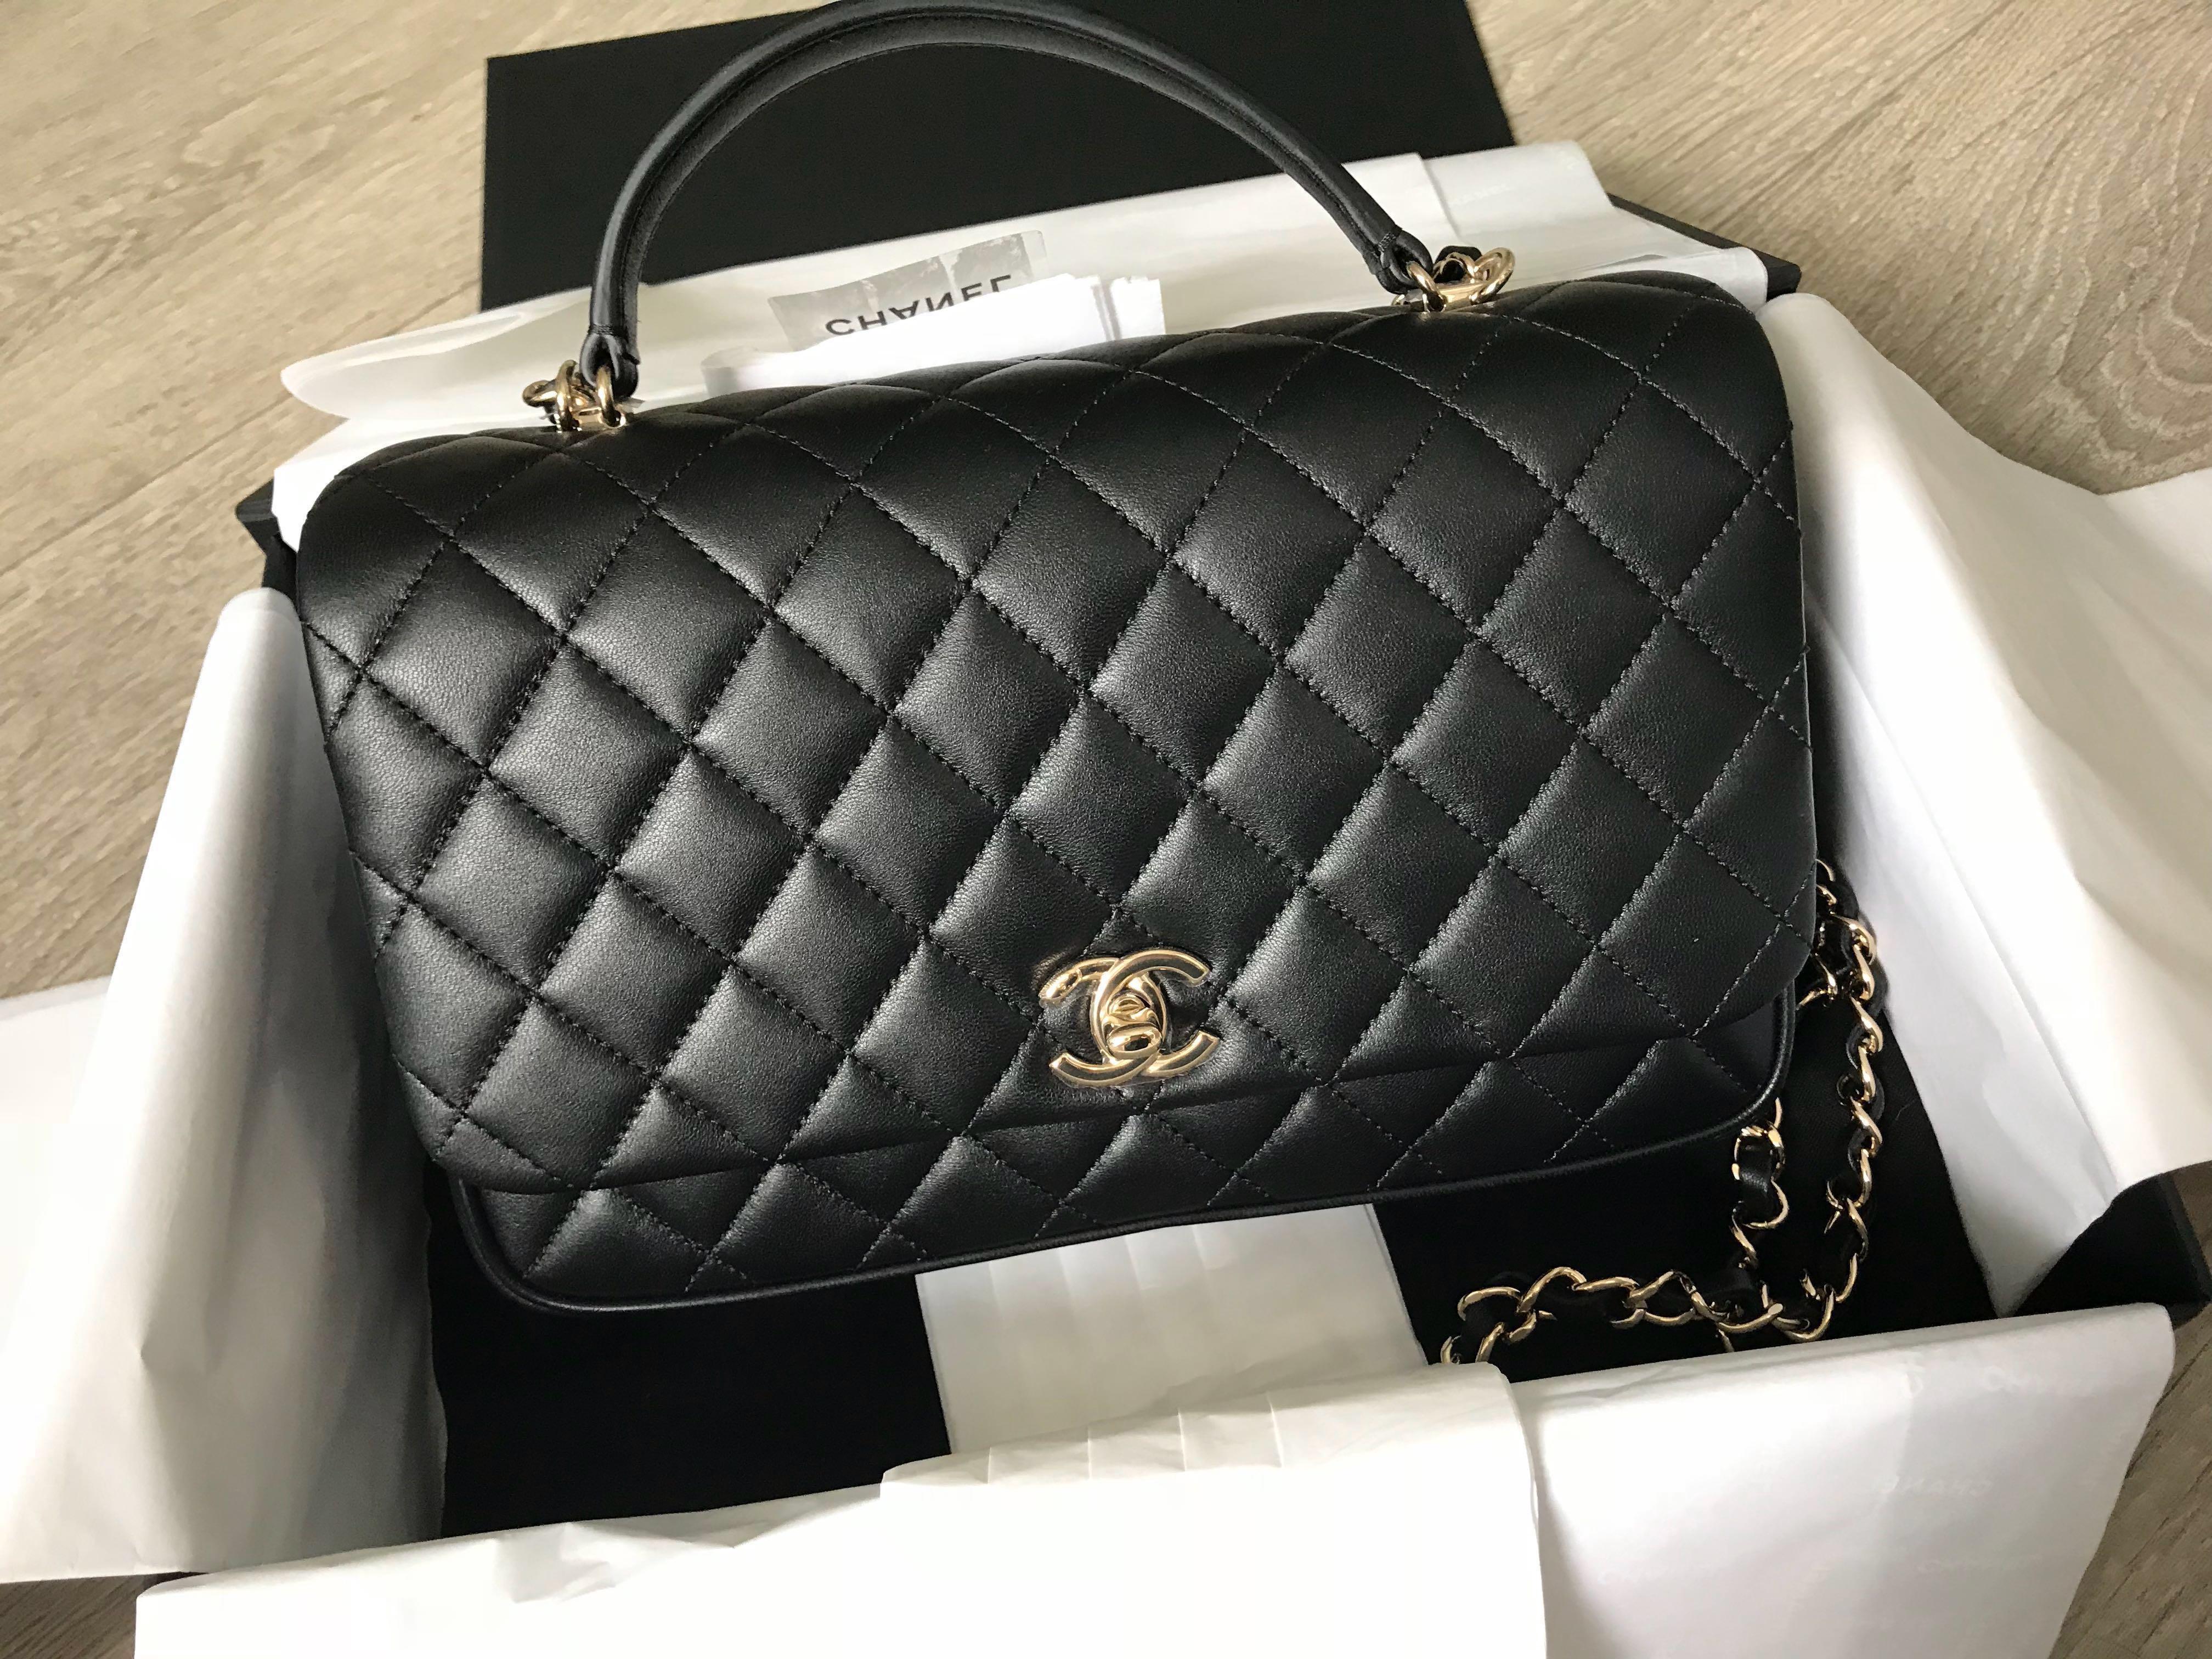 1108e2ff1c Chanel Citizen Chic flap bag, Women's Fashion, Bags & Wallets ...